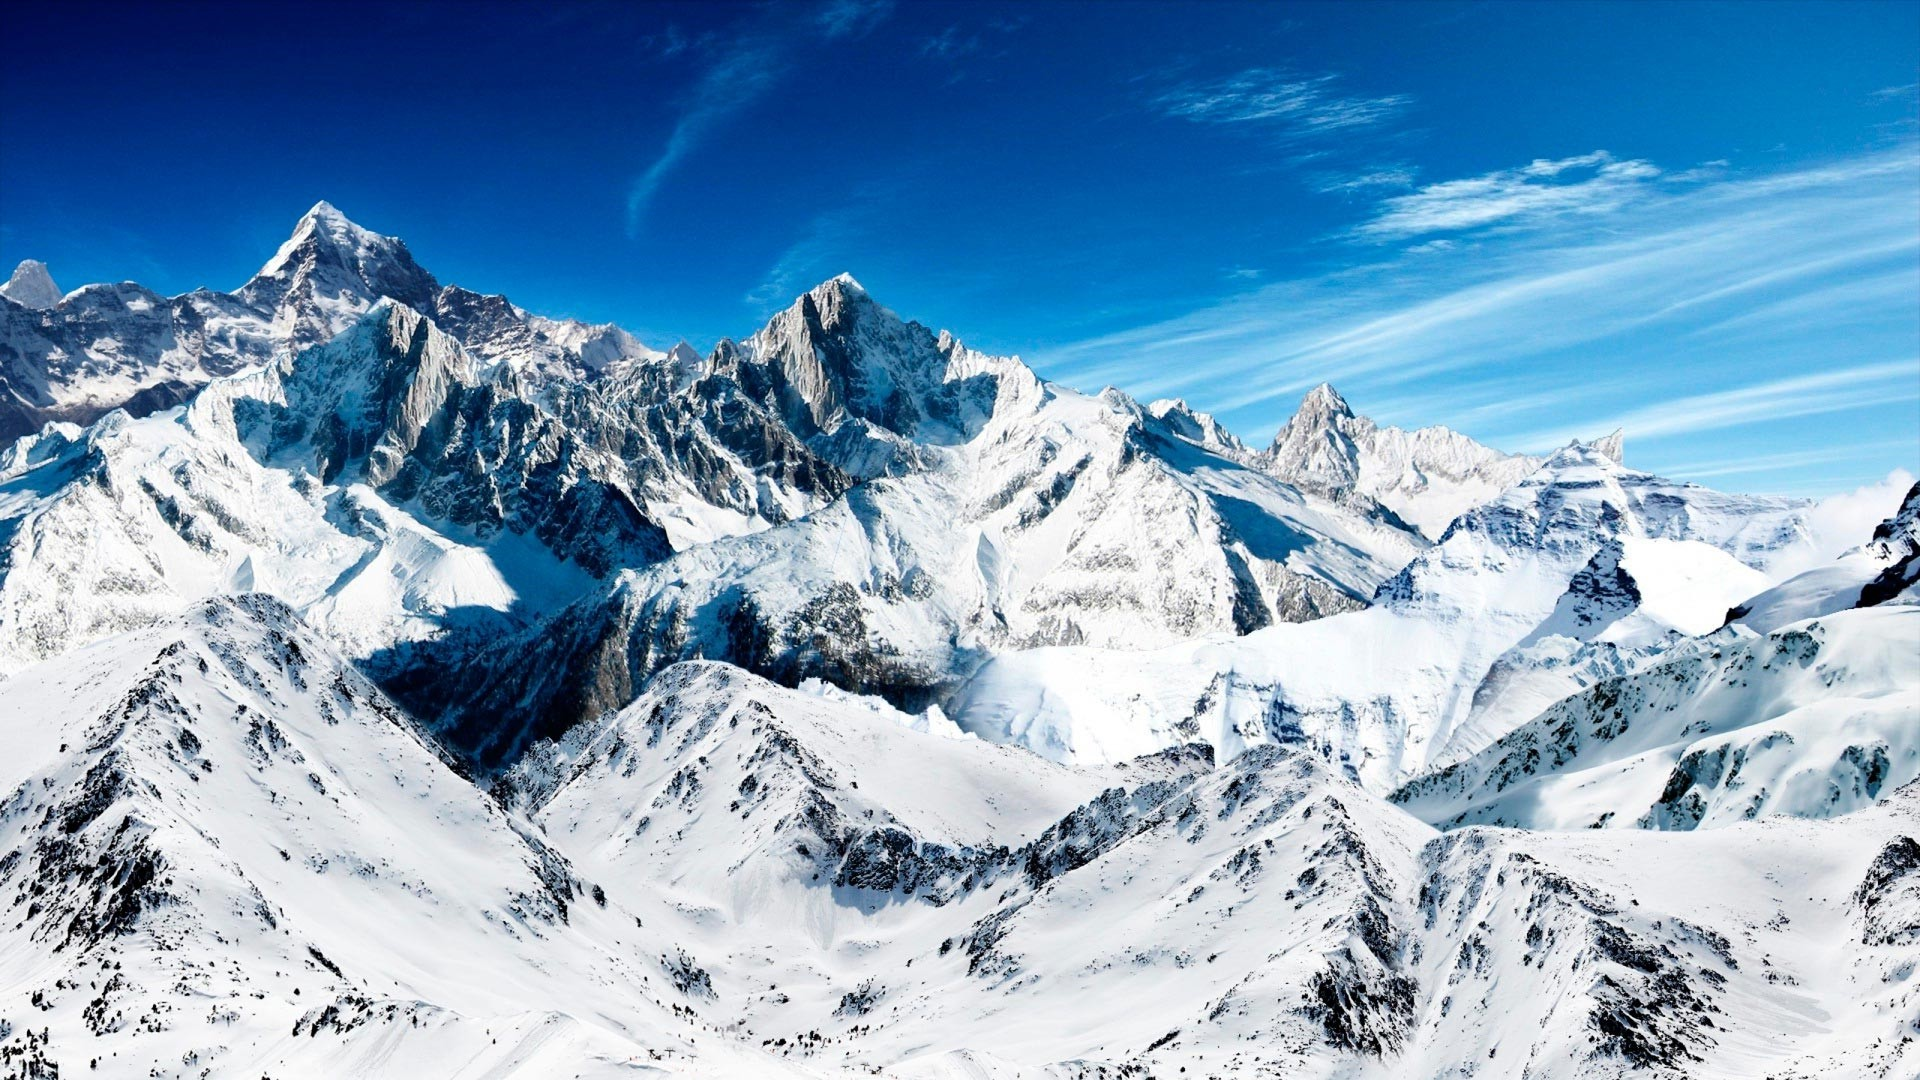 Snow Mountain Wallpaper for pc